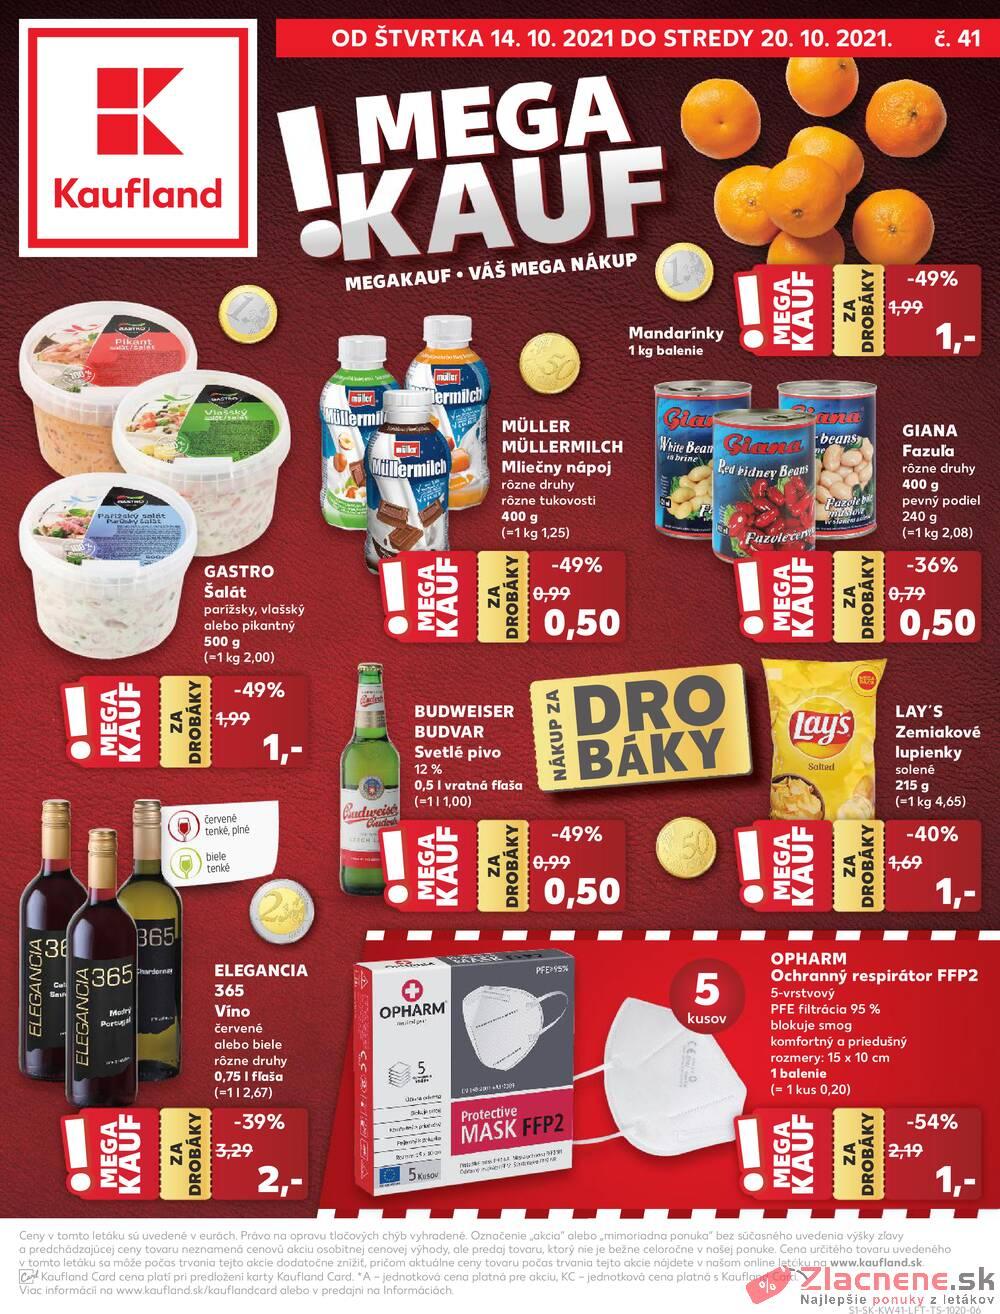 Leták Kaufland - Kaufland 14.10. - 21.10. - Kaufland Skalica - Mallého - strana 1